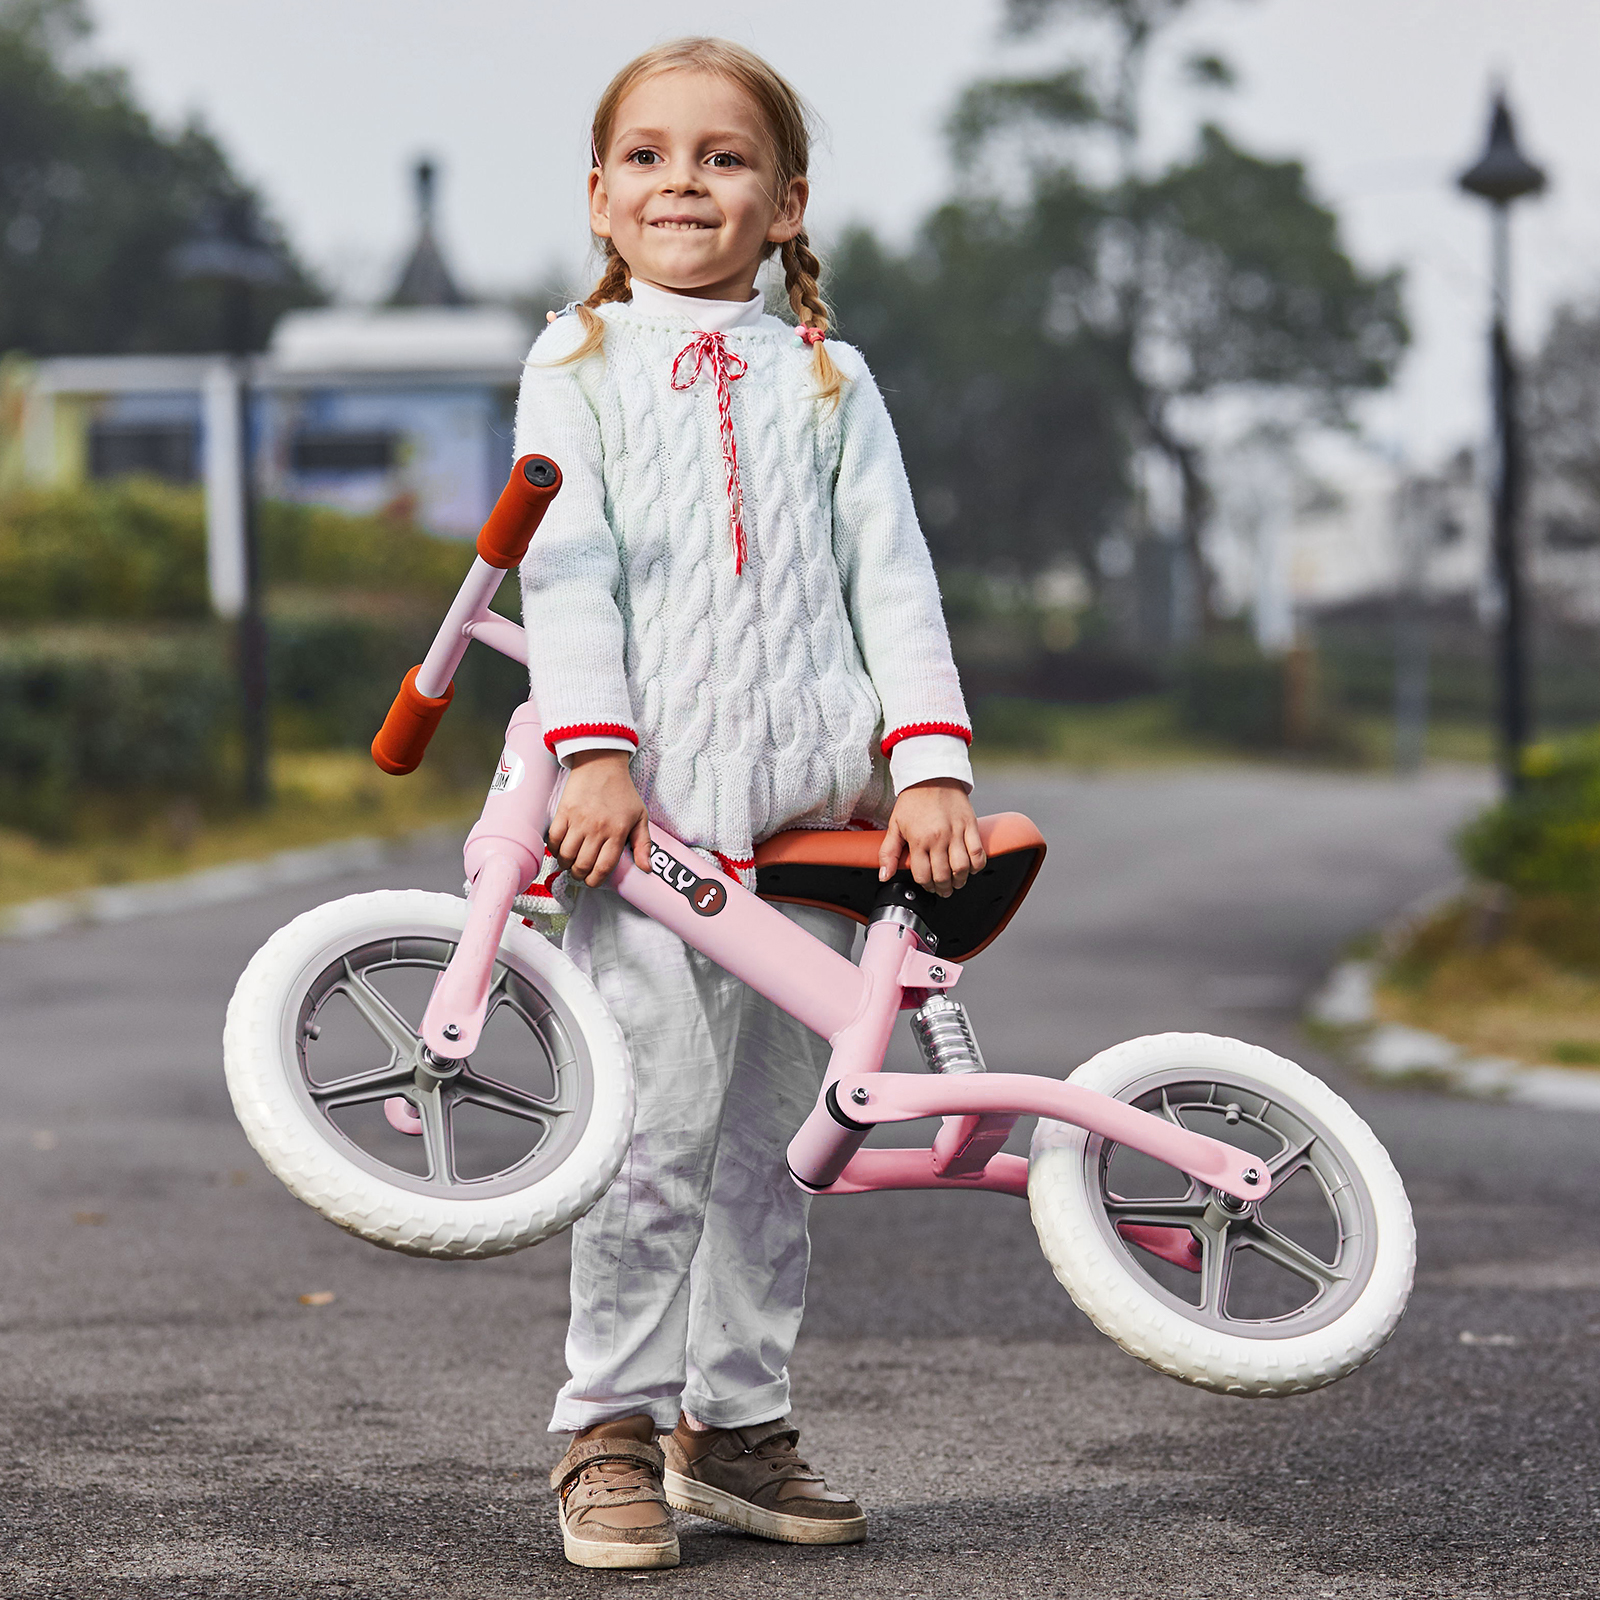 Indexbild 29 - HOMCOM Laufrad mit Stoßdämpfer Kinderrad Lauflernrad Balance Bike 2-5 Jahre